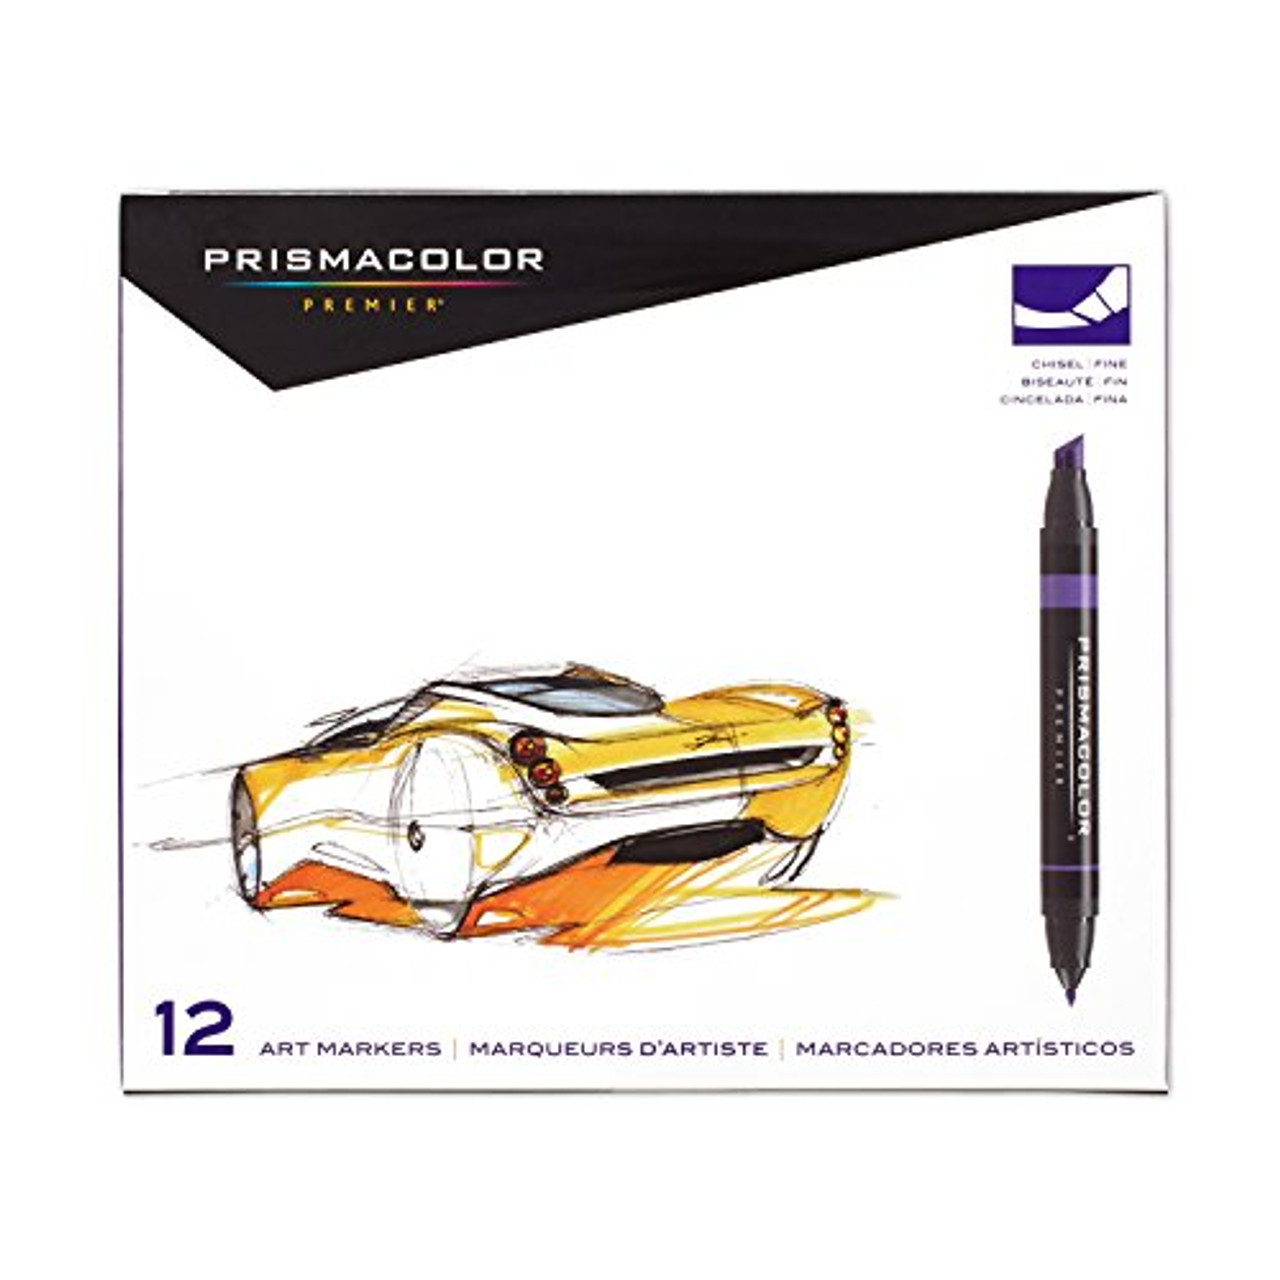 Prismacolor Marker 12pc Set